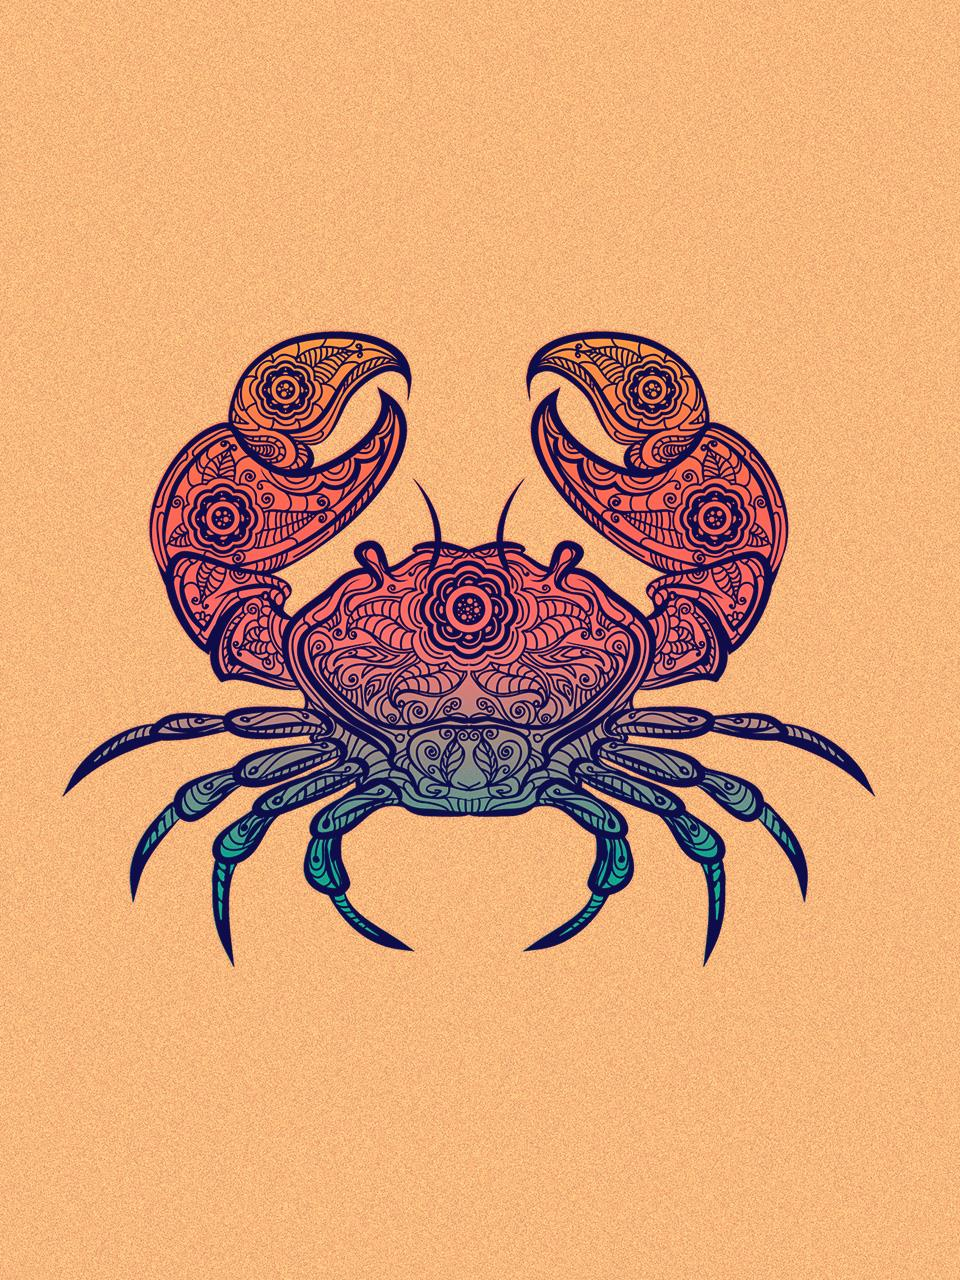 Zodiac Tattoo Designs For Girls